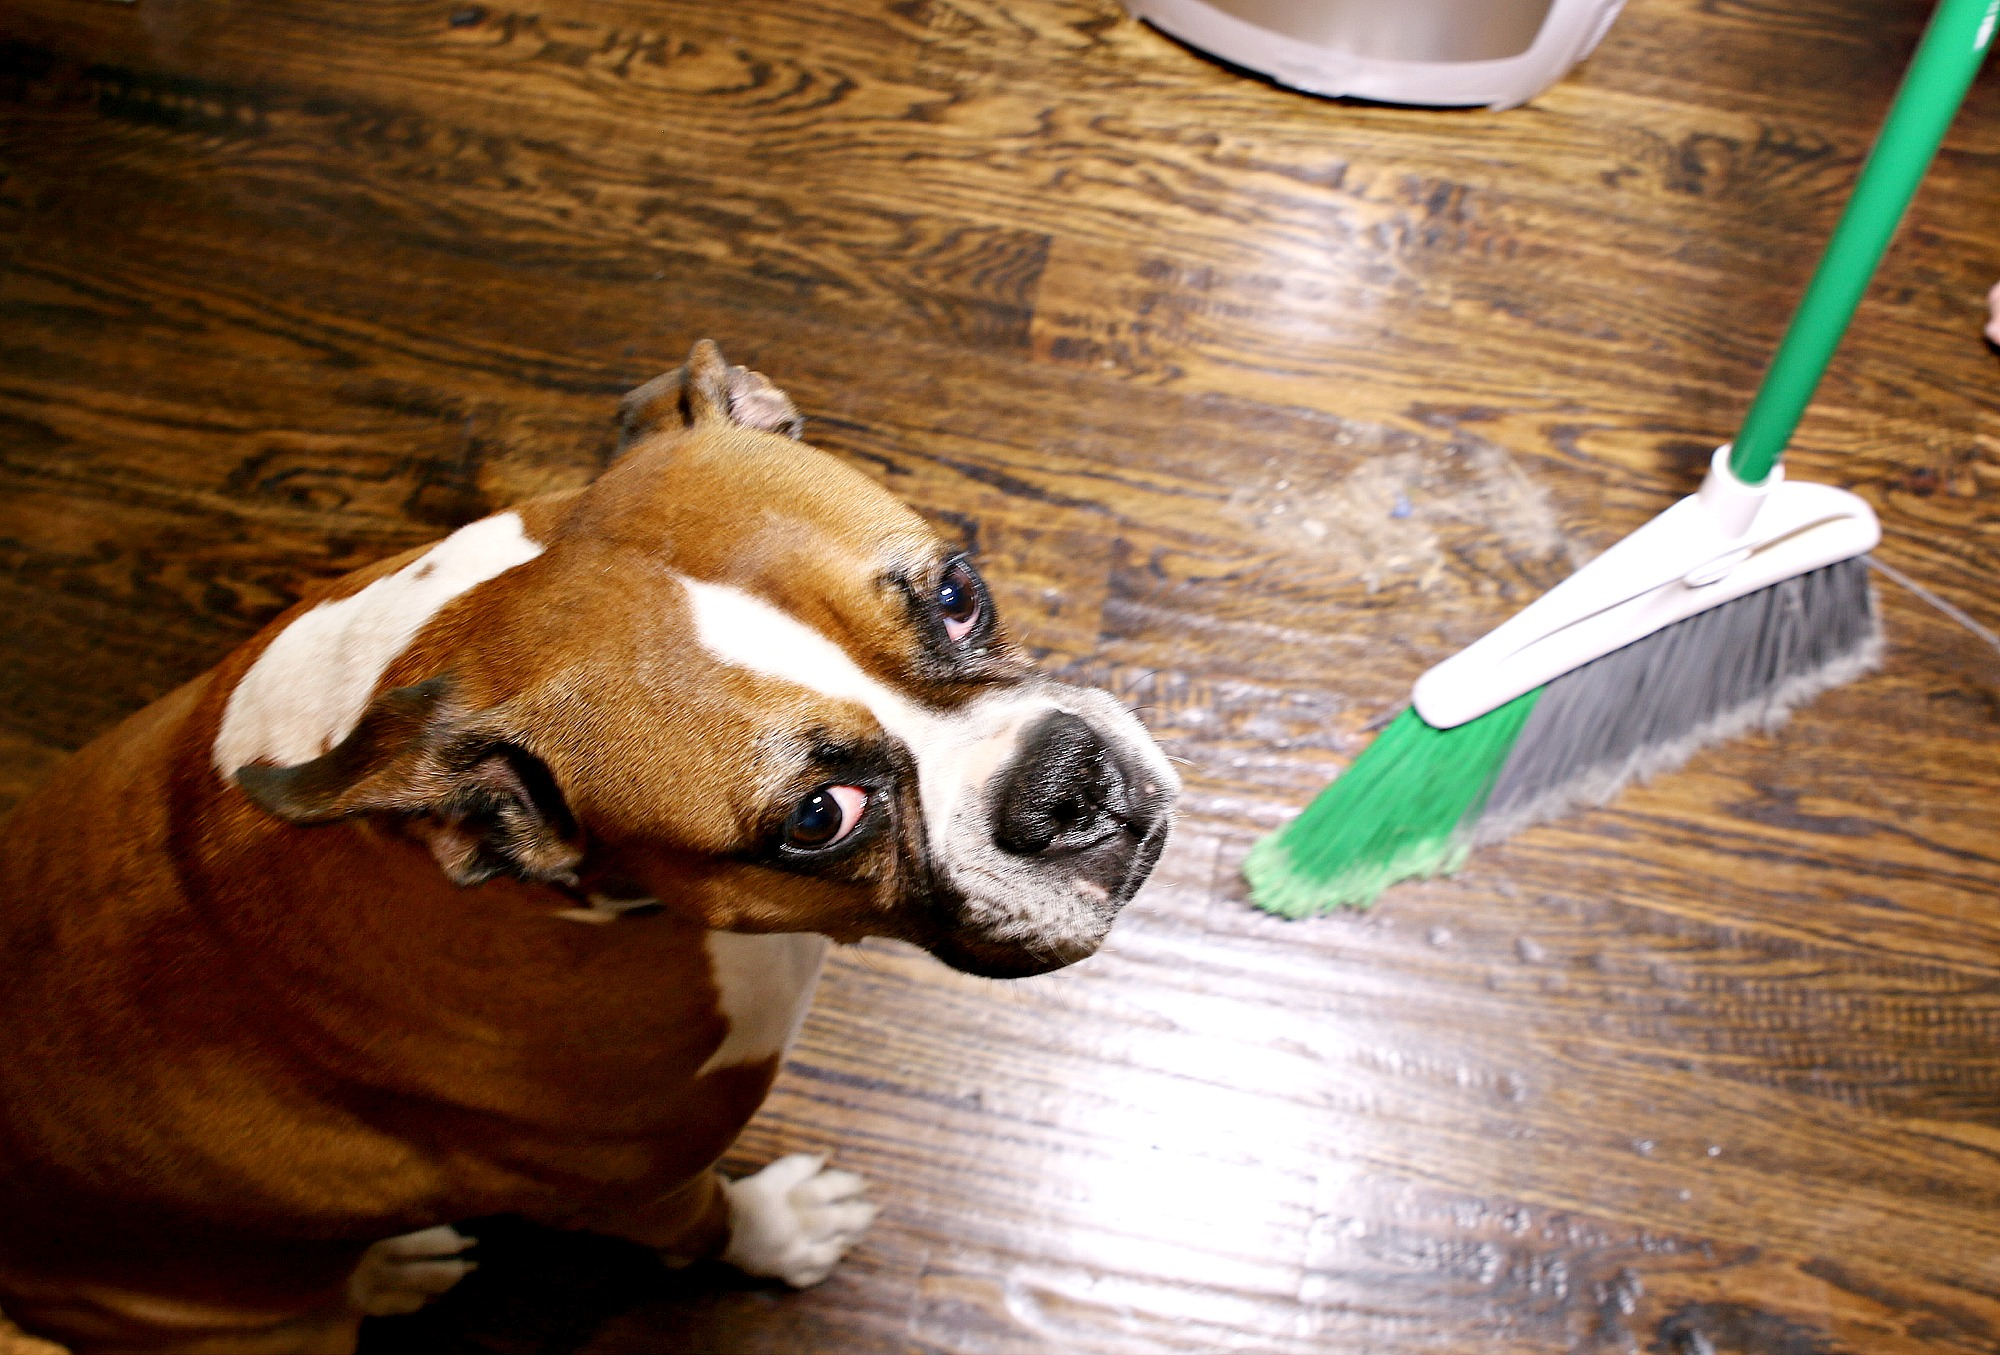 Make Sweeping Hardwood Floors a Breeze - Eye-Vac Review